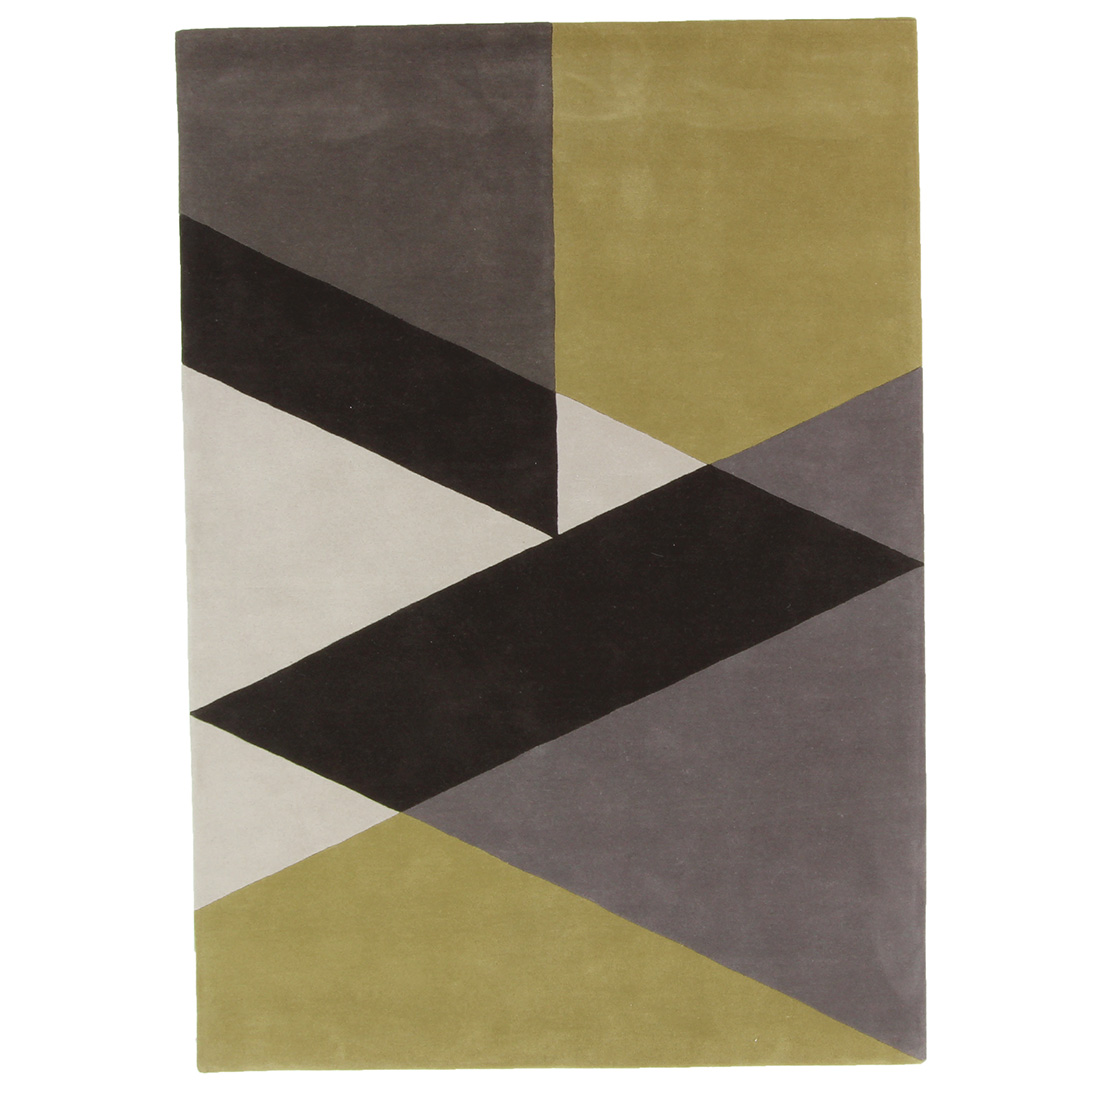 Vloerkleed Brinker Gaudion Ponzio | 170 x 230 cm